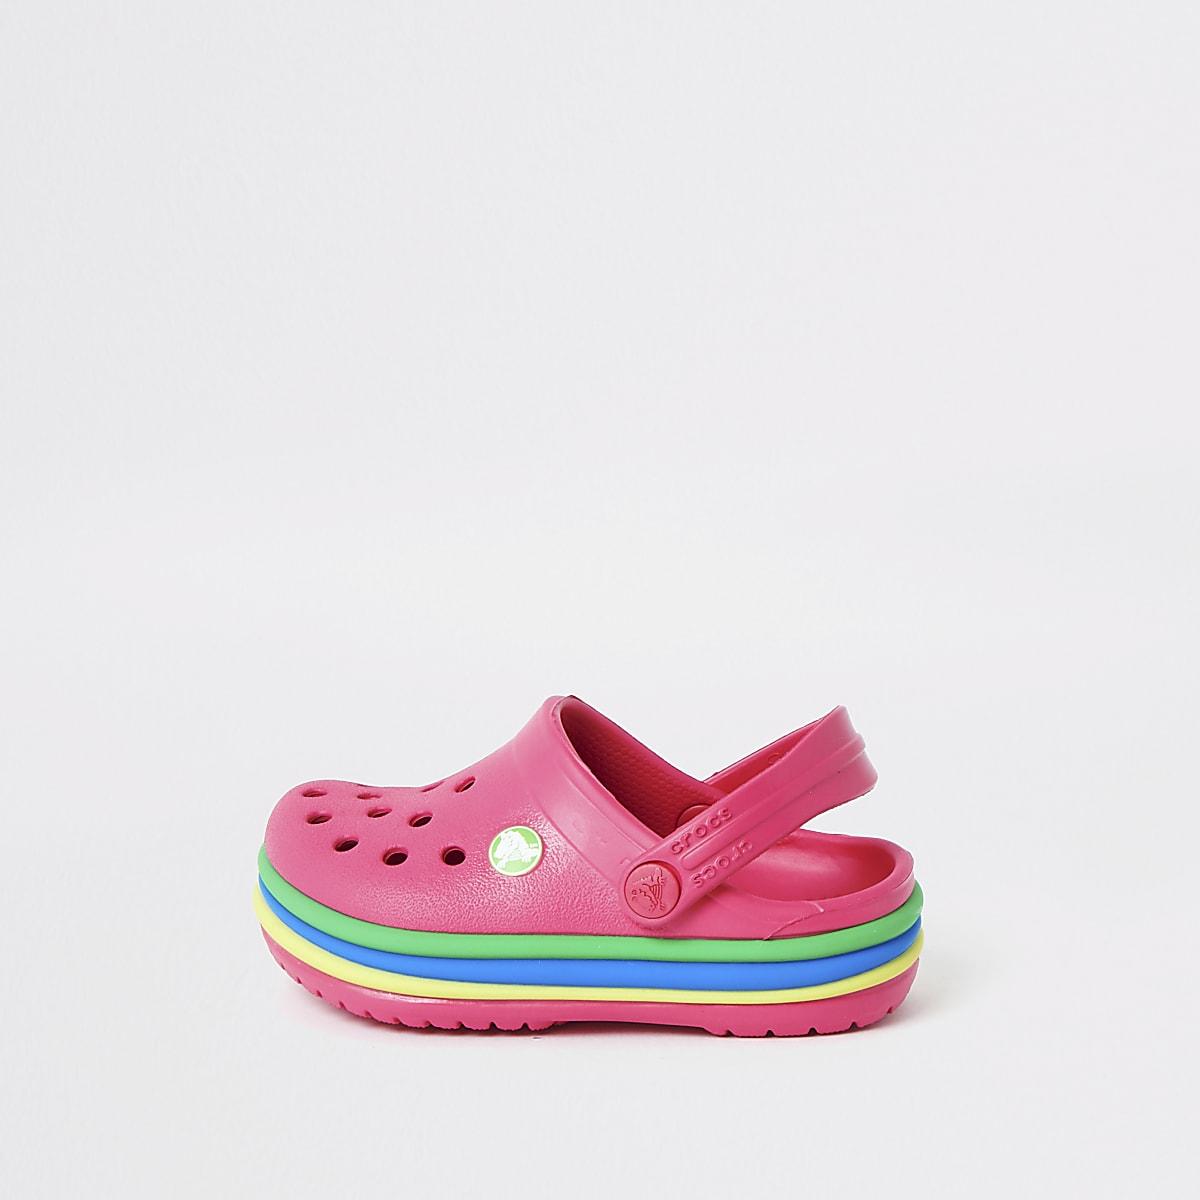 info for a9172 bde02 Mini girls Crocs pink rainbow clogs